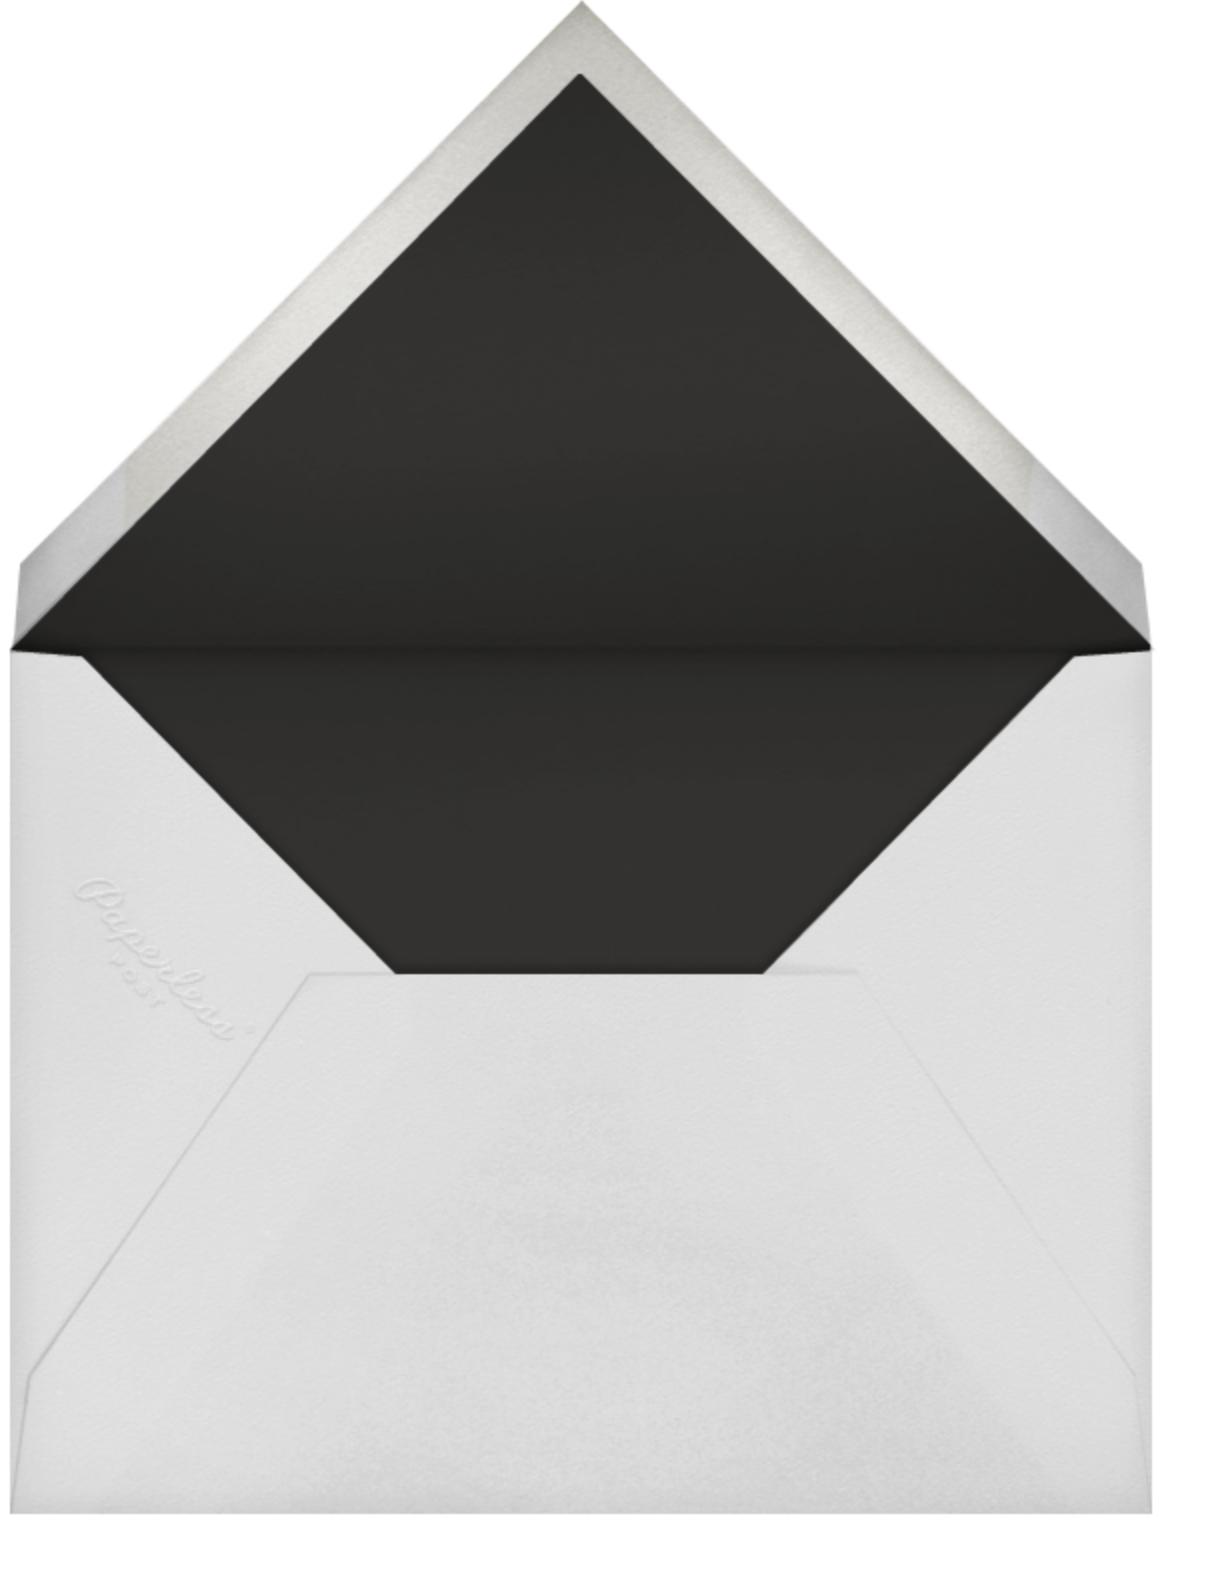 Hat Trick - Paperless Post - St. Patrick's Day - envelope back